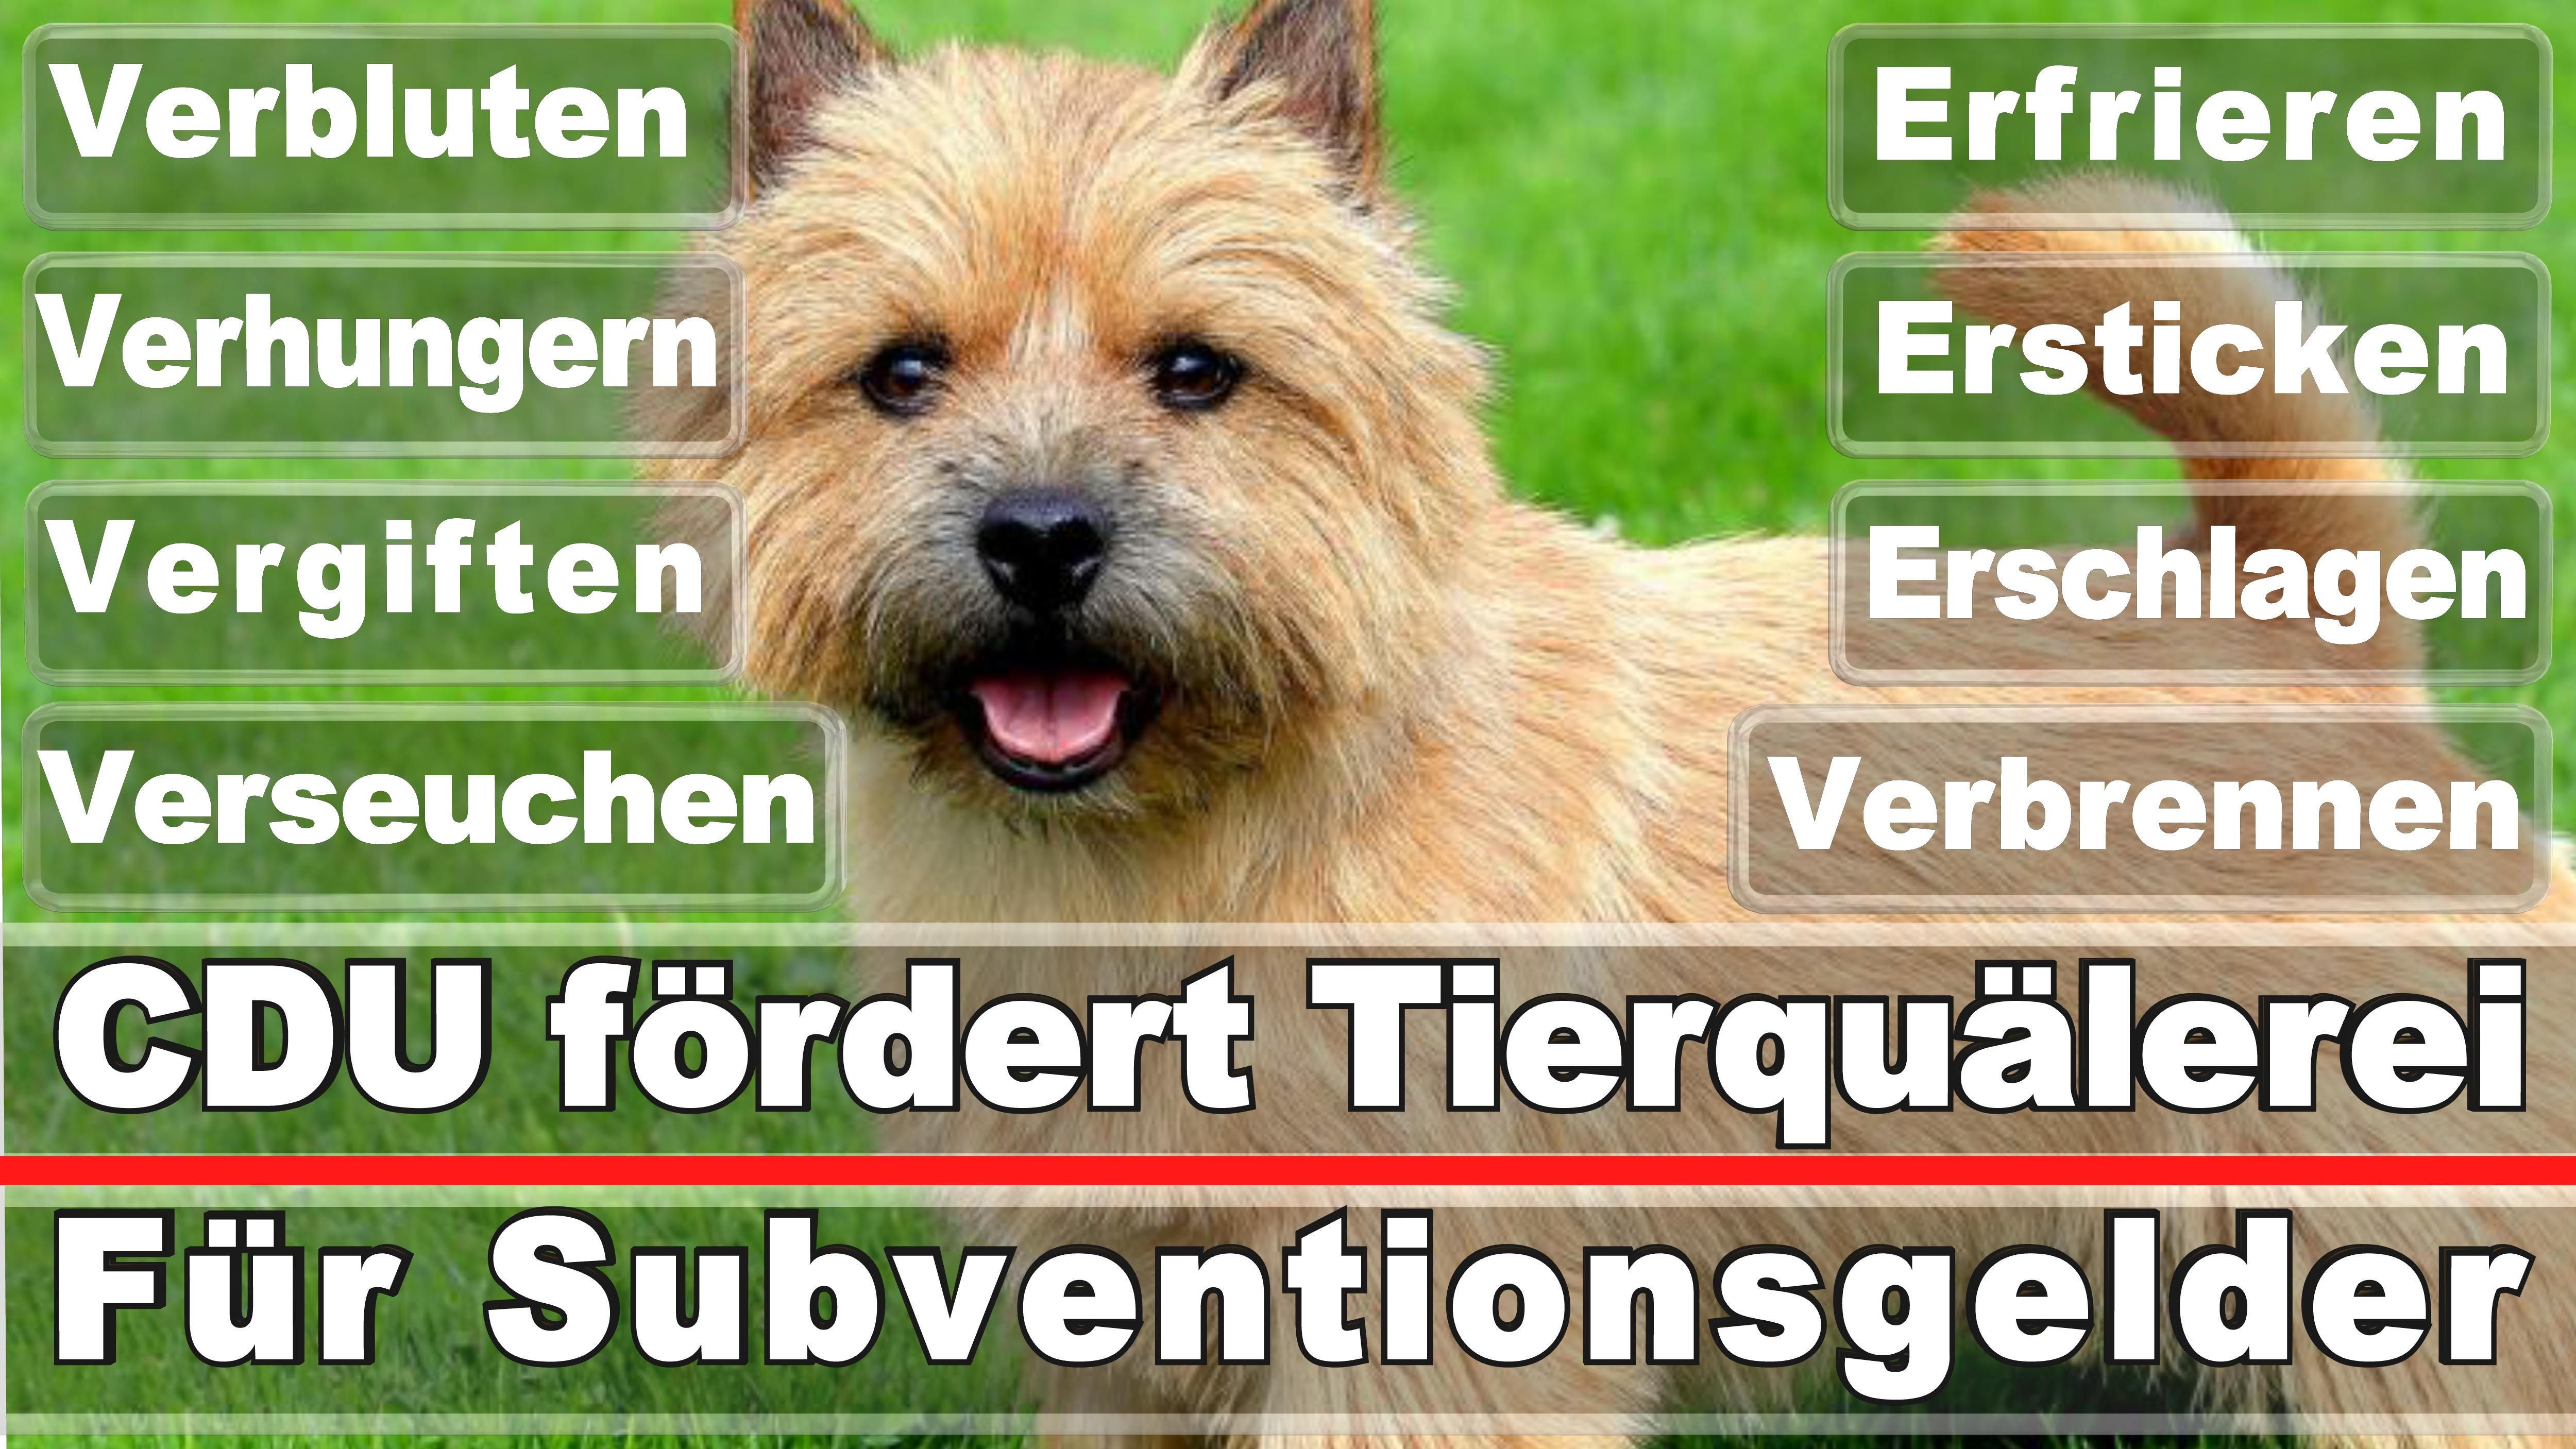 Landtagswahl-Bundestagswahl-CDU-SPD-FDP-AFD-Linke-Piraten-Tierschutzpartei (24)